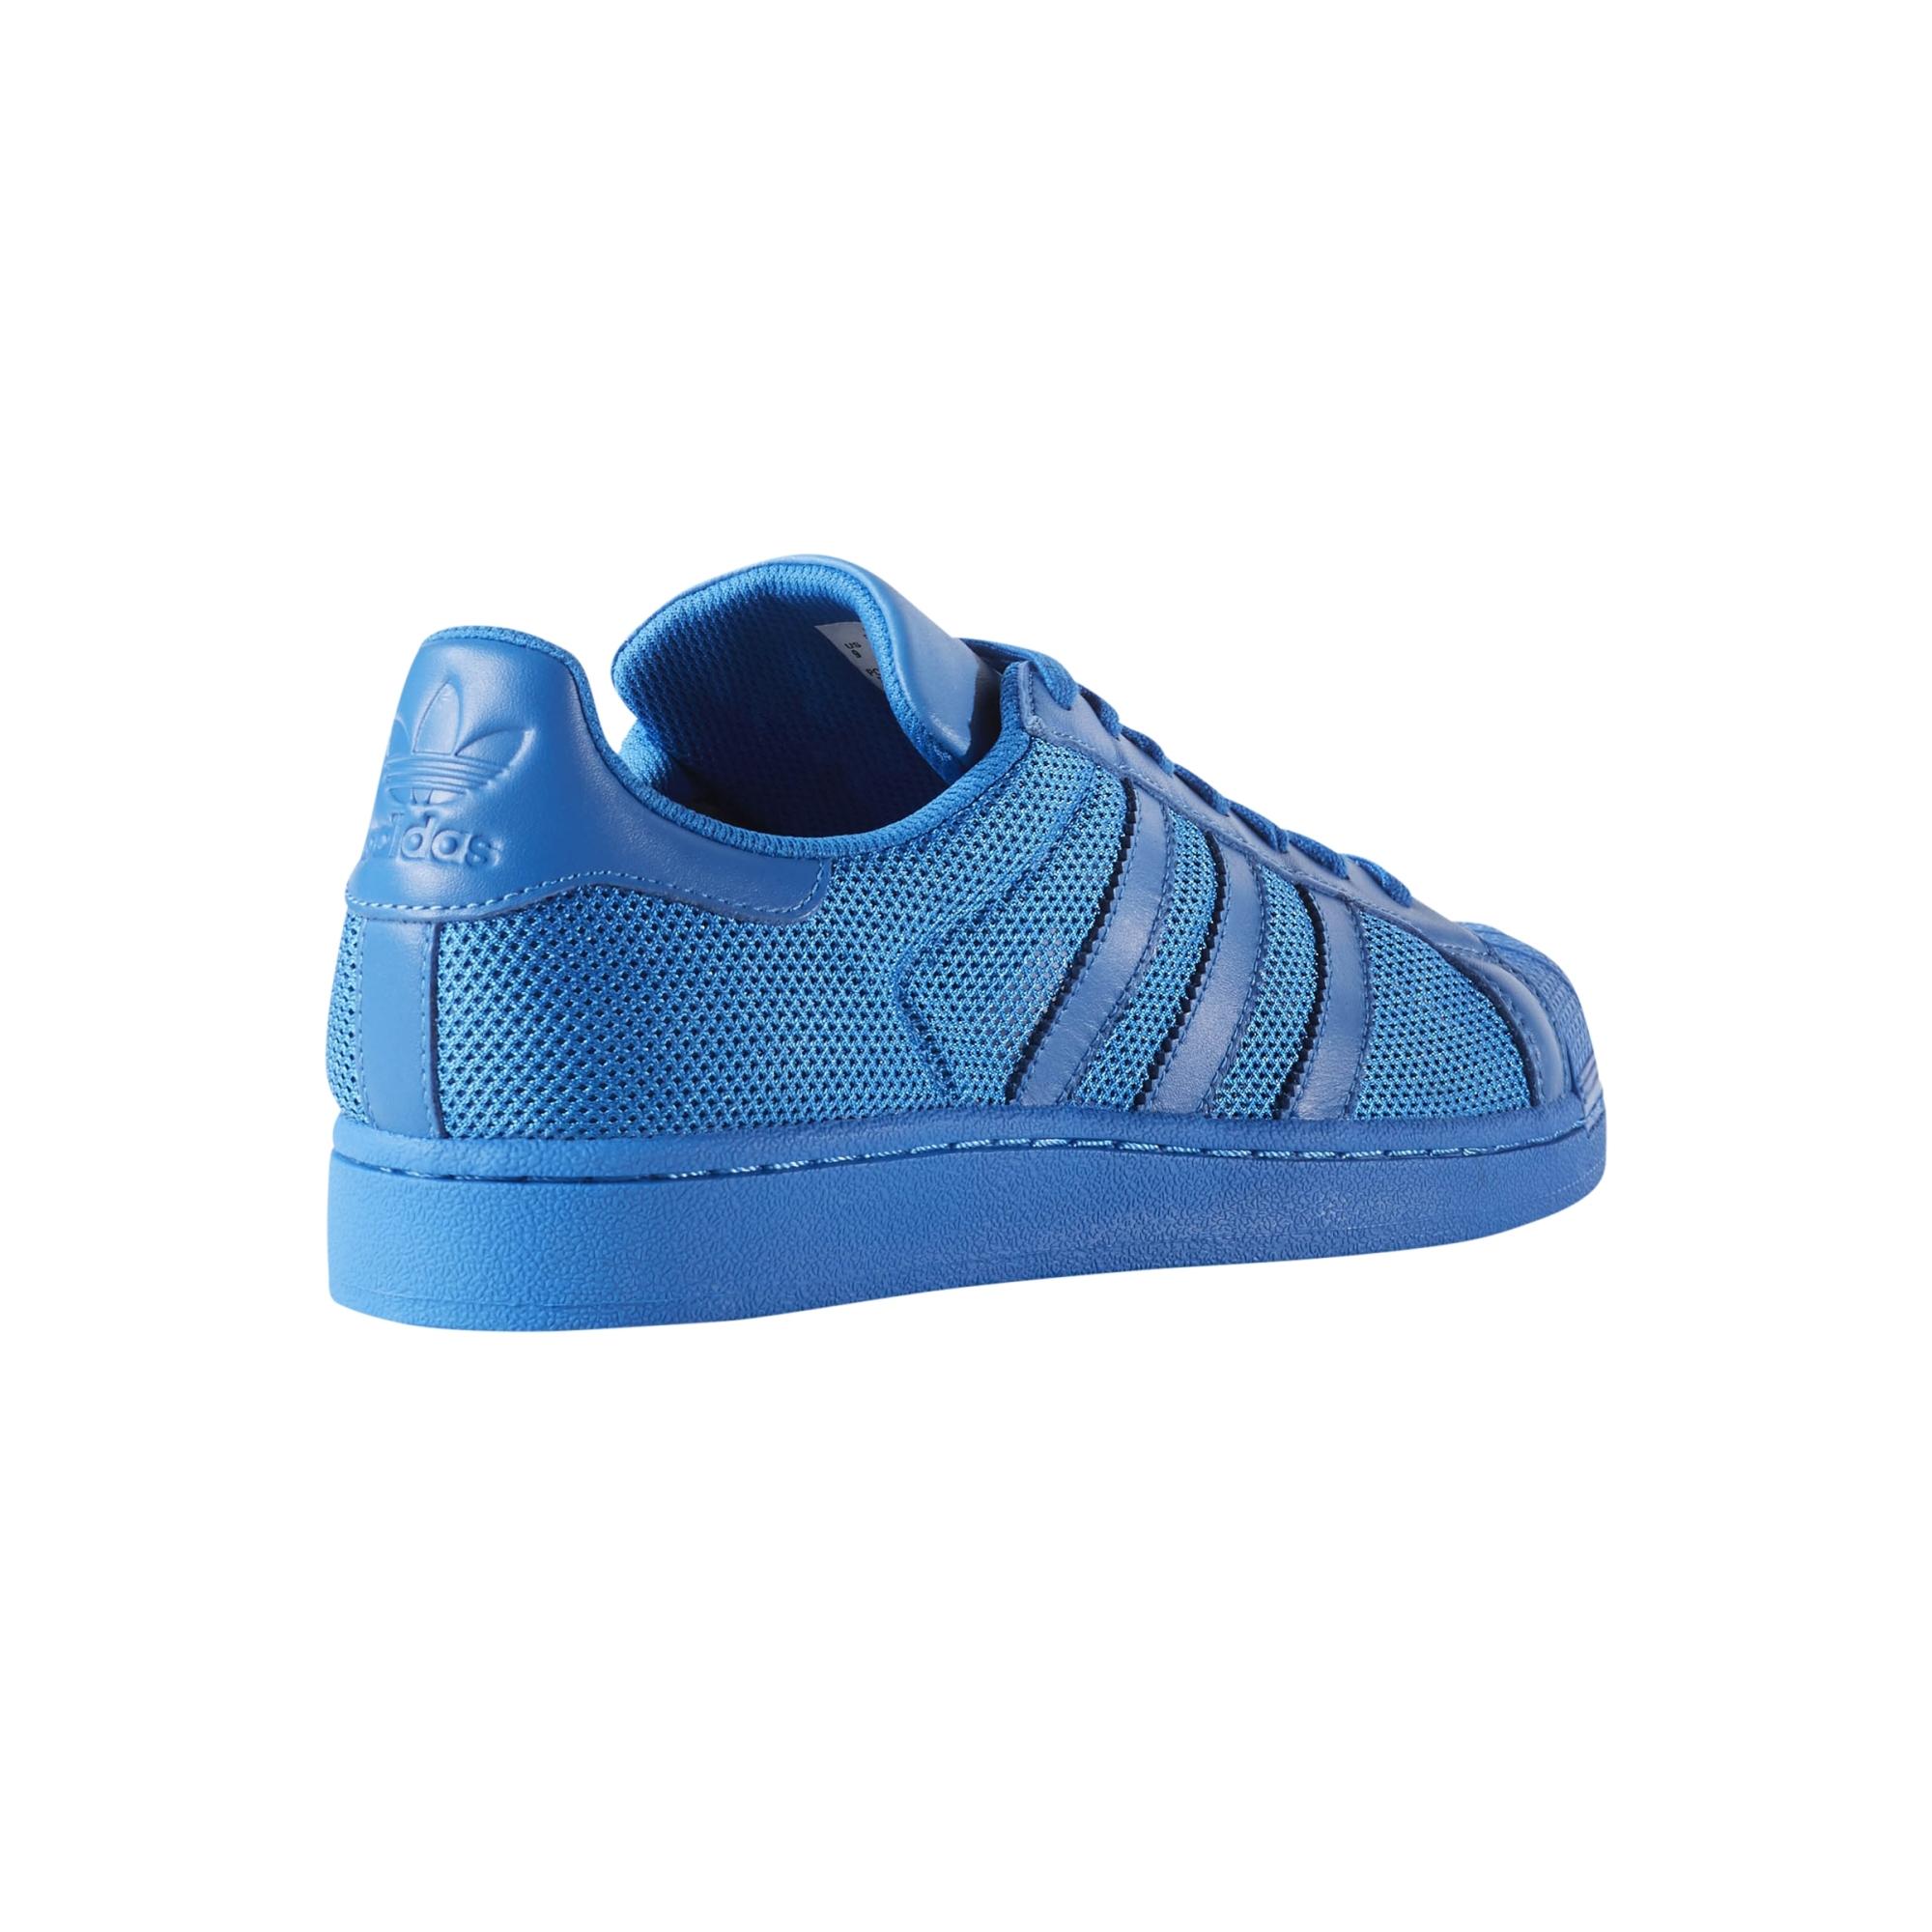 Adidas Originals Superstar Summer Time Bleubird Bleubird Bleubird Bleubird e33c71